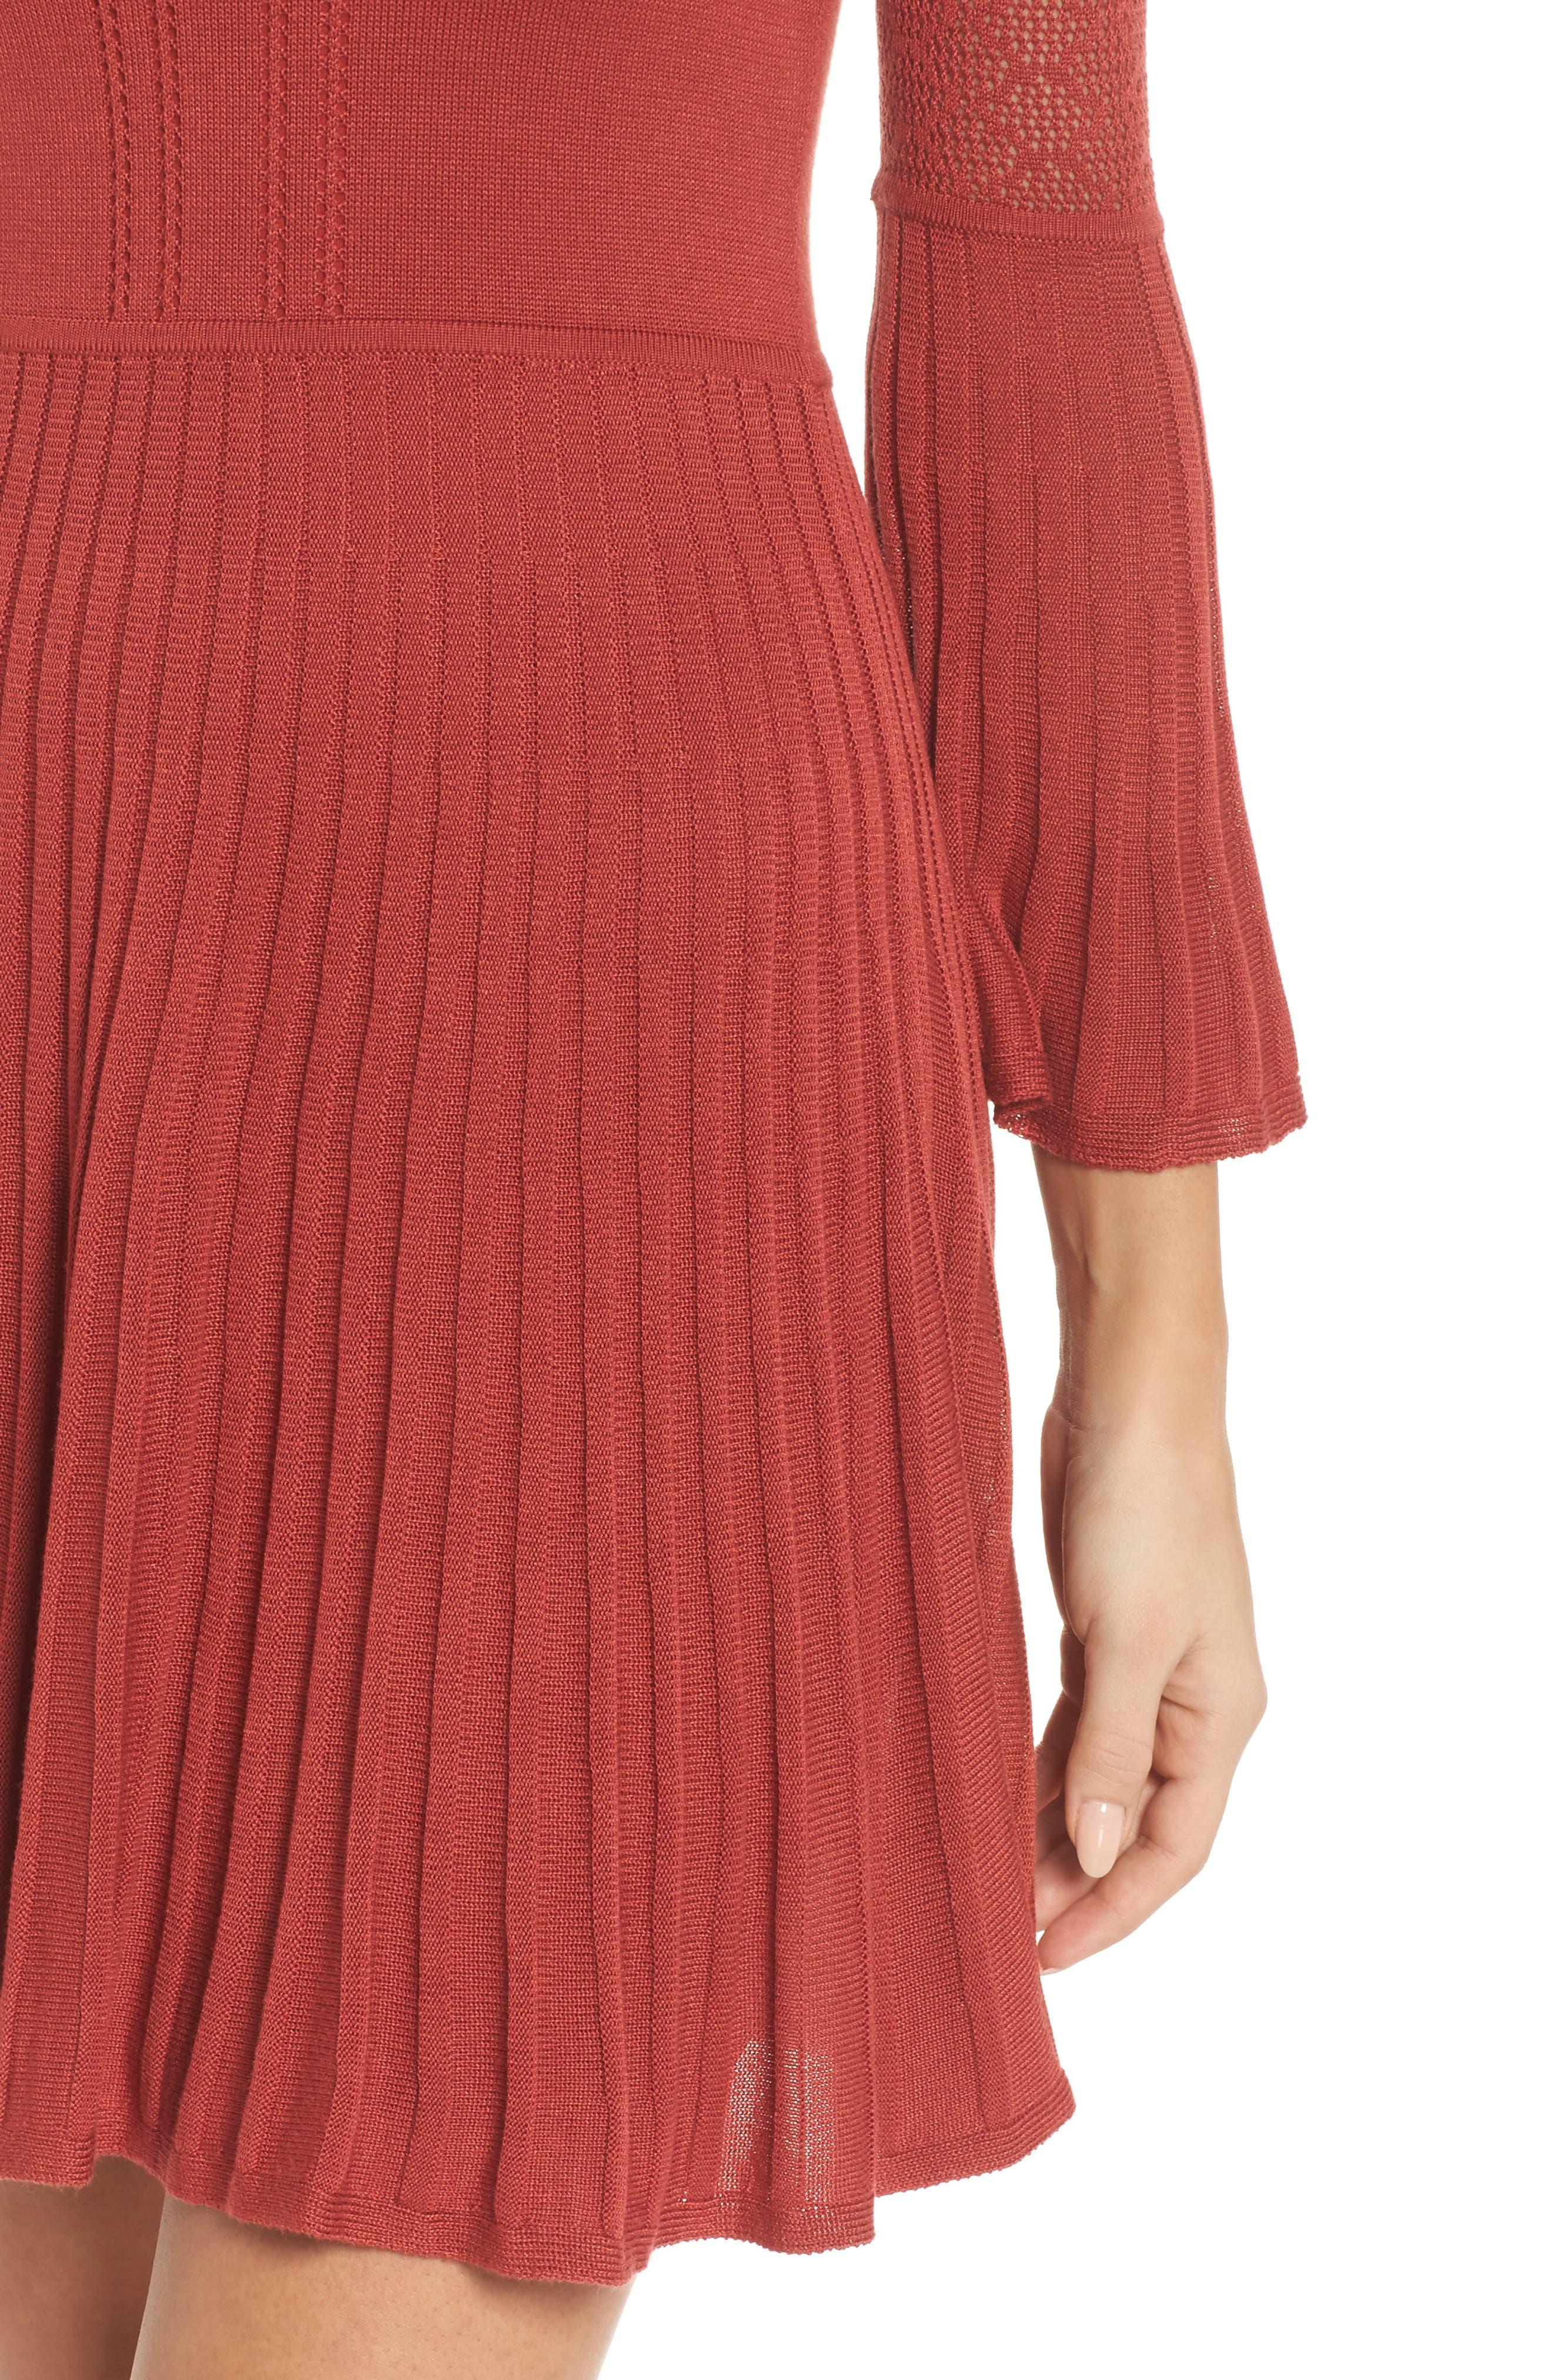 Private Concert Sweater Dress,                             Alternate thumbnail 4, color,                             600